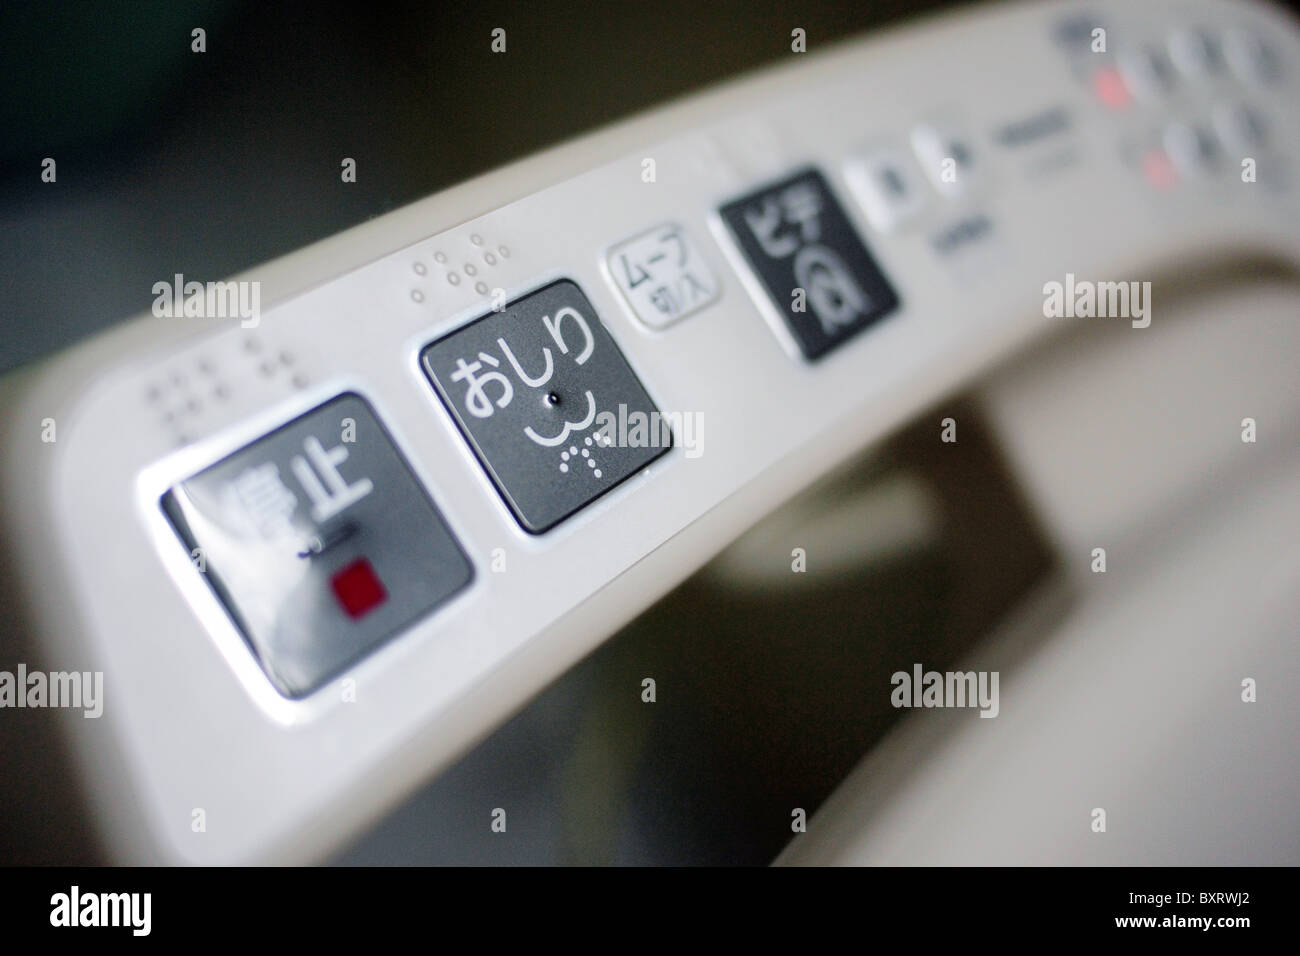 Japanische Toilette hi tech moderne elektronische japanische toilette in asien